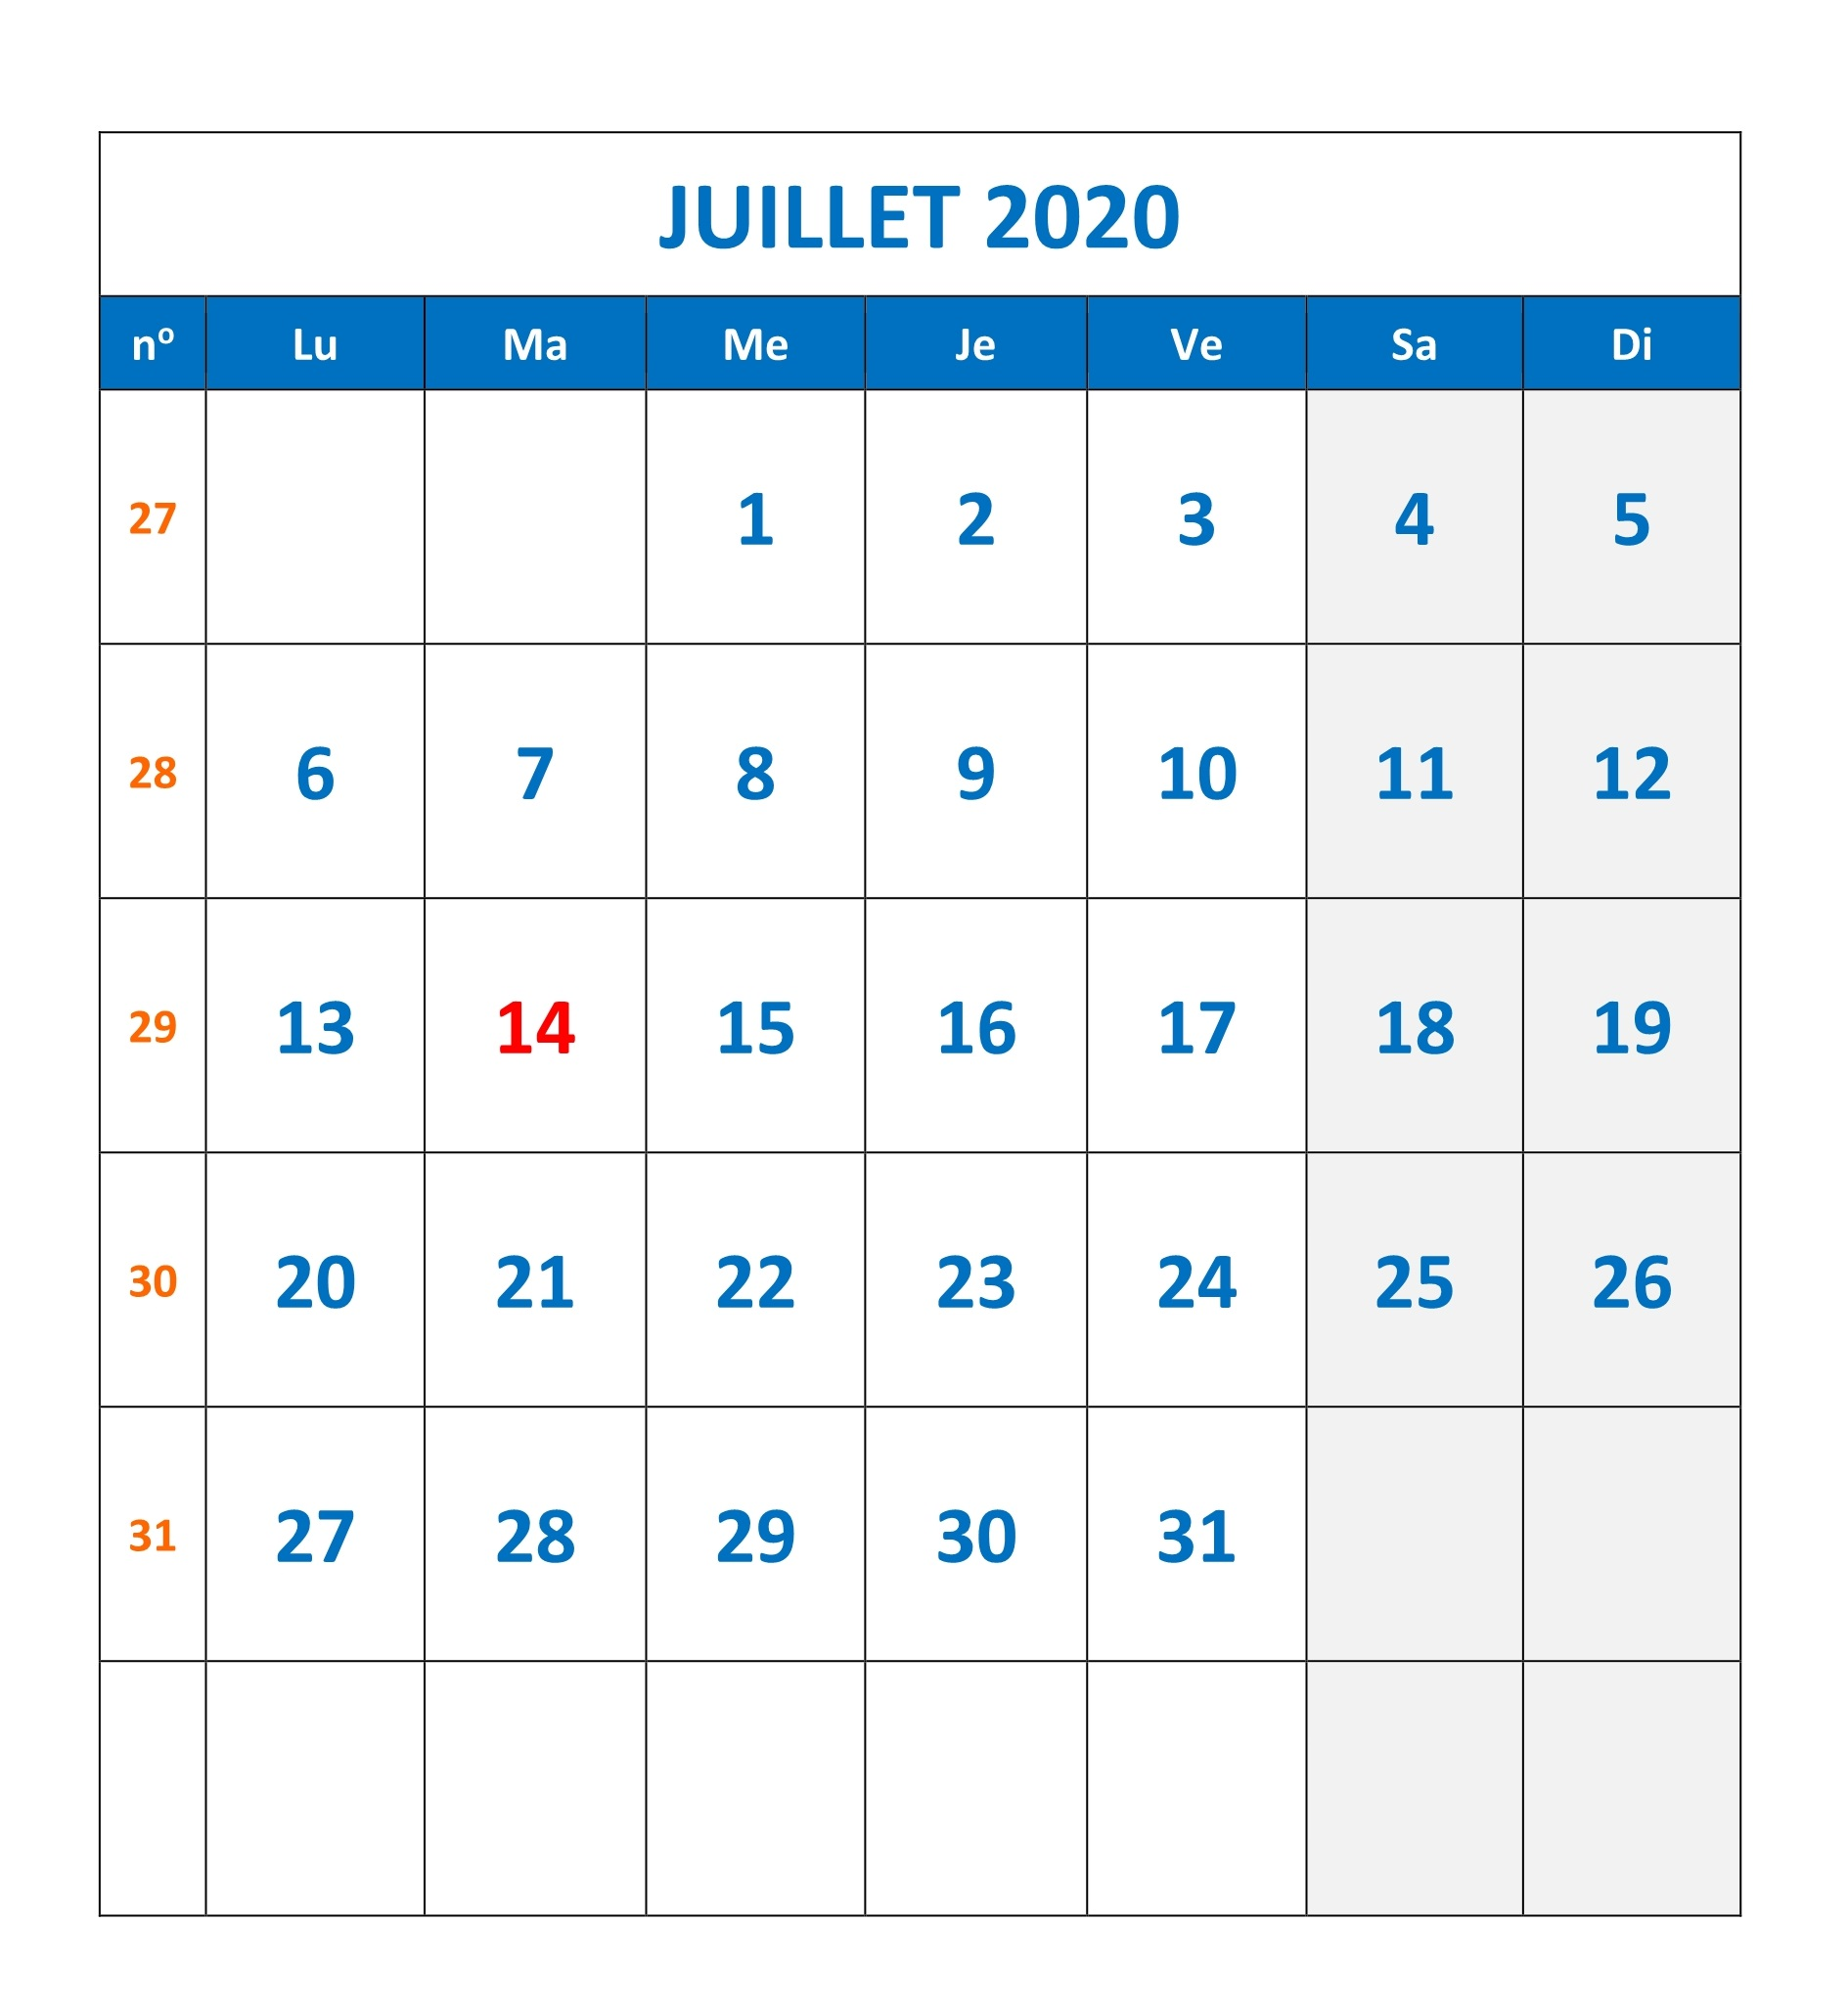 Calendrier Juillet 2020 vacances